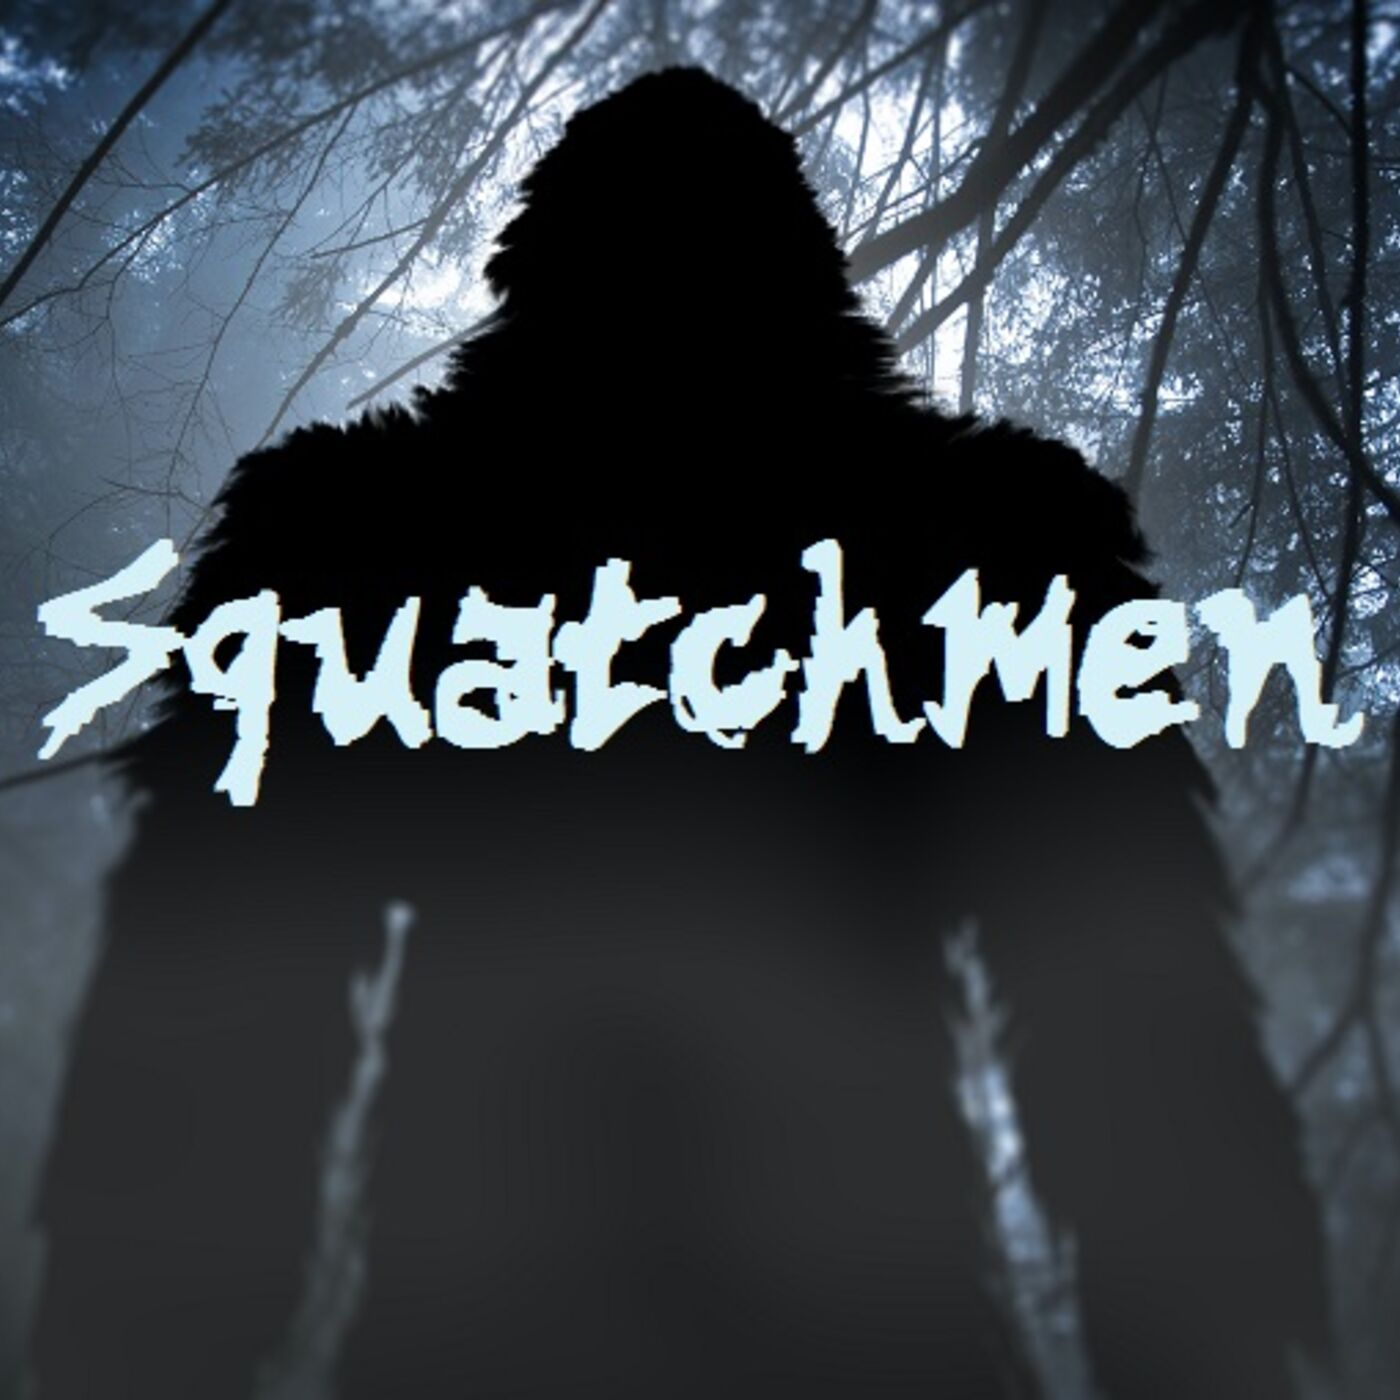 Squatchmen